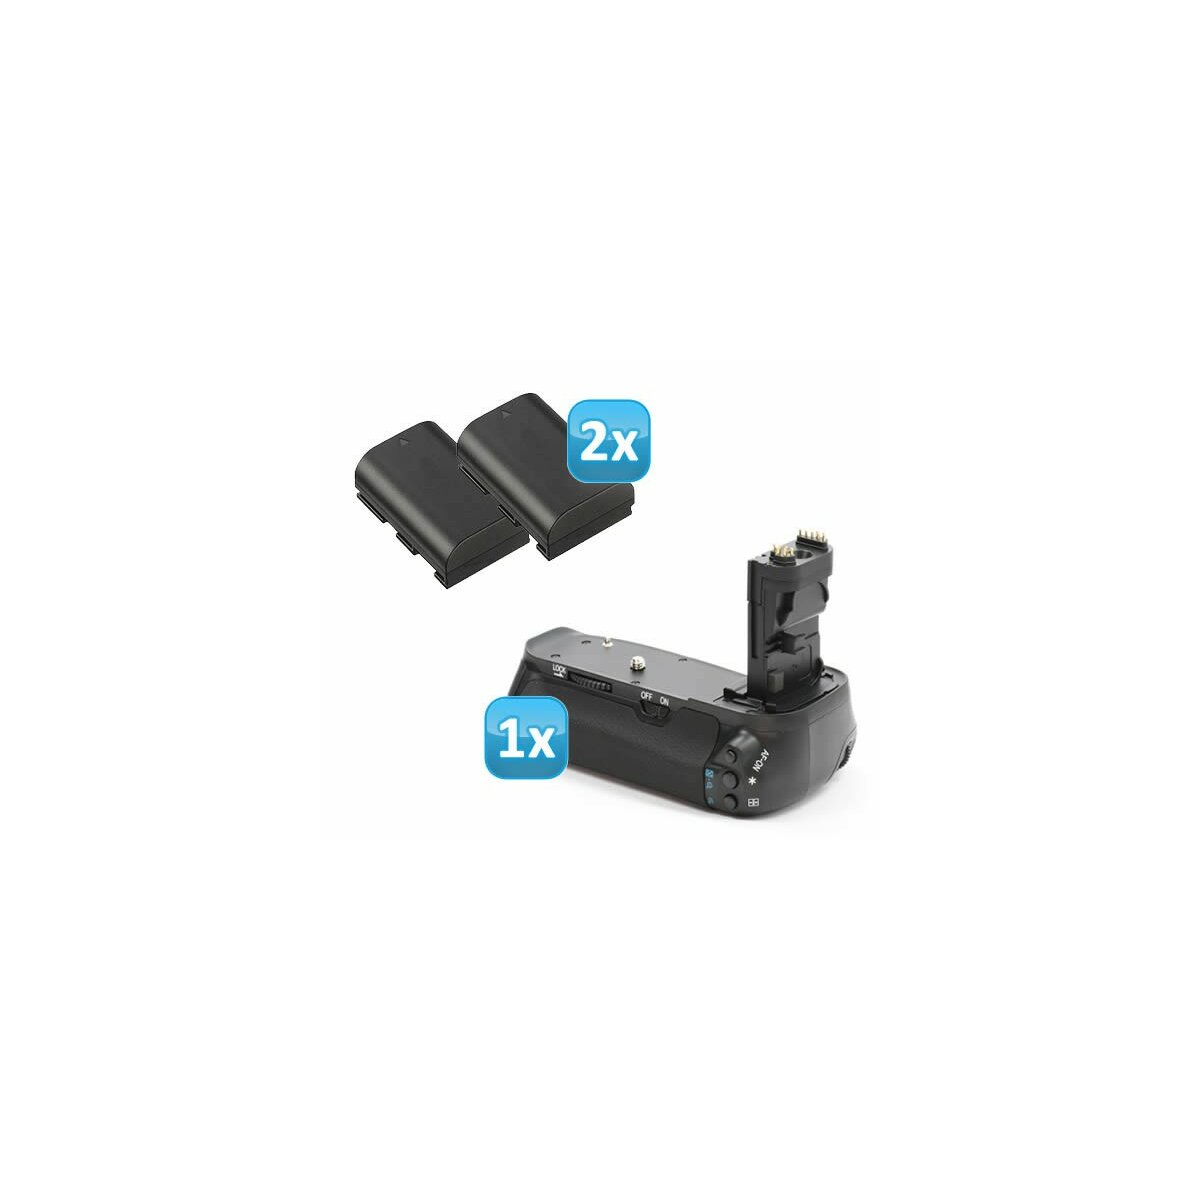 Profi Batteriegriff + 2x Akkus fuer Canon EOS 60D wie der BG-E9, inkl. 2x Li-Ion Akku wie LP-E6